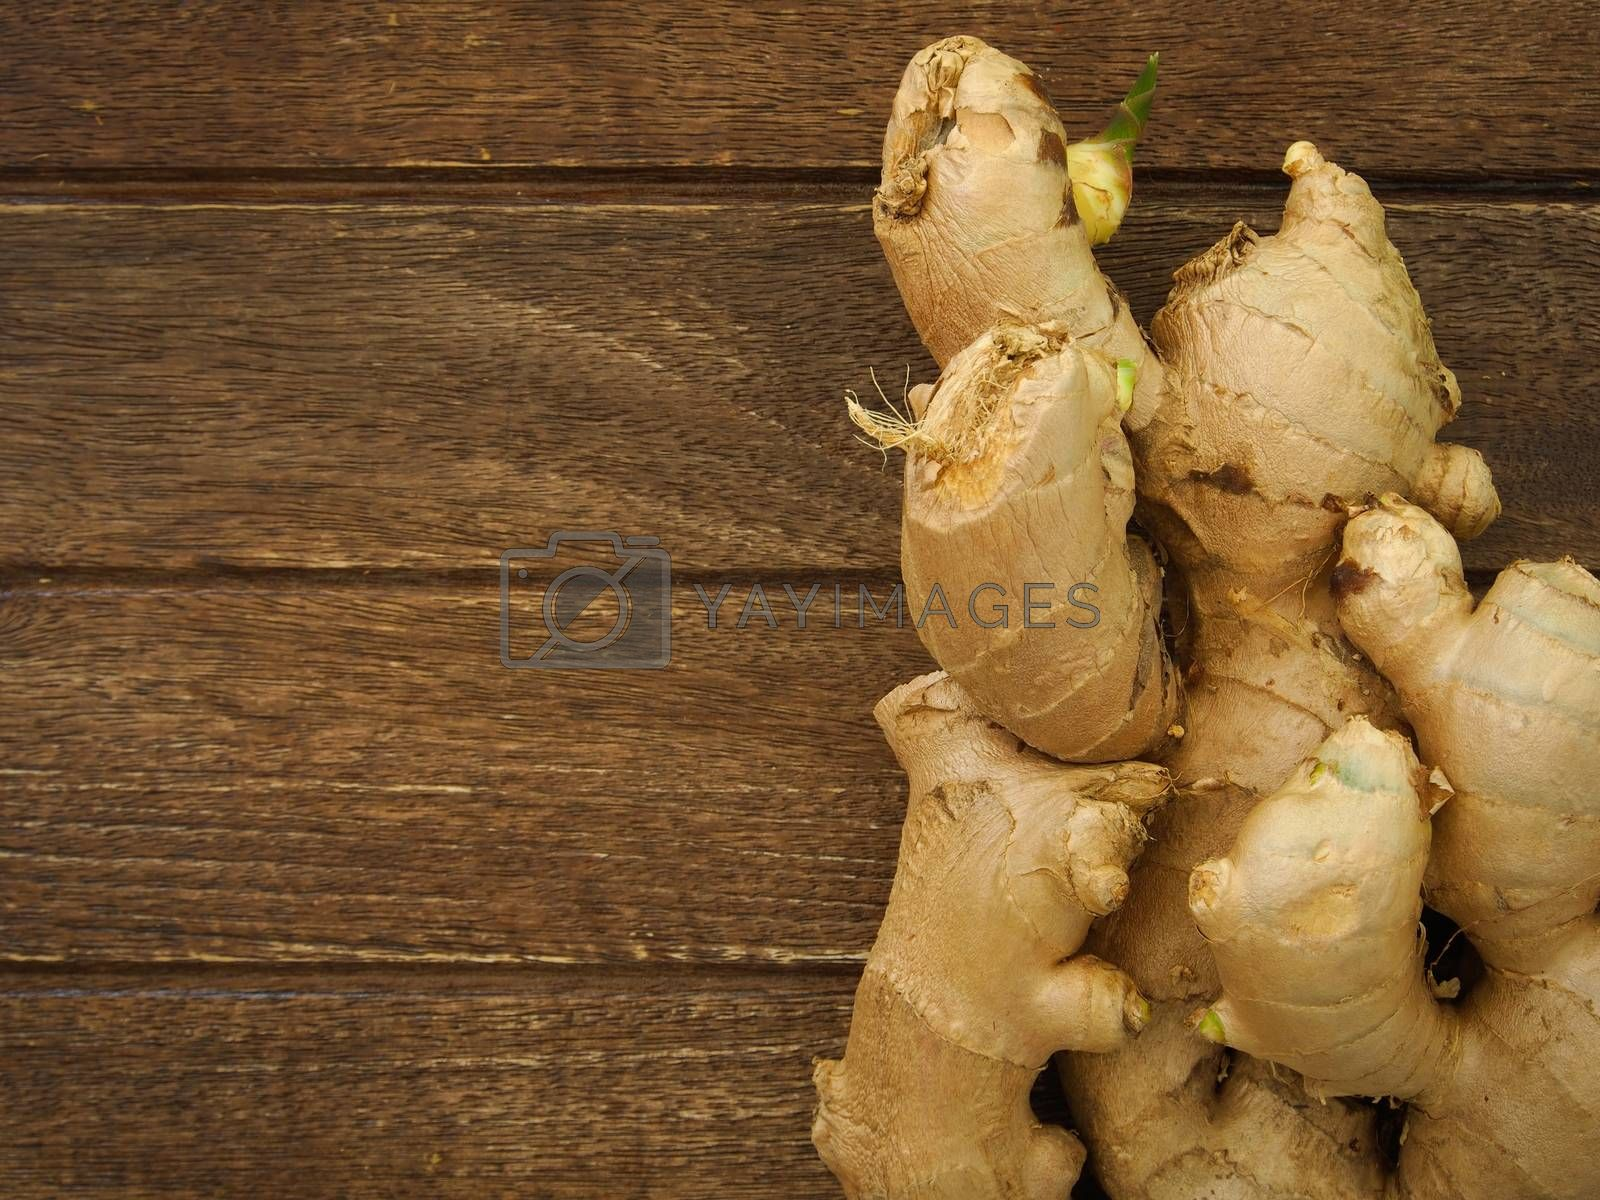 ginger on wooden background